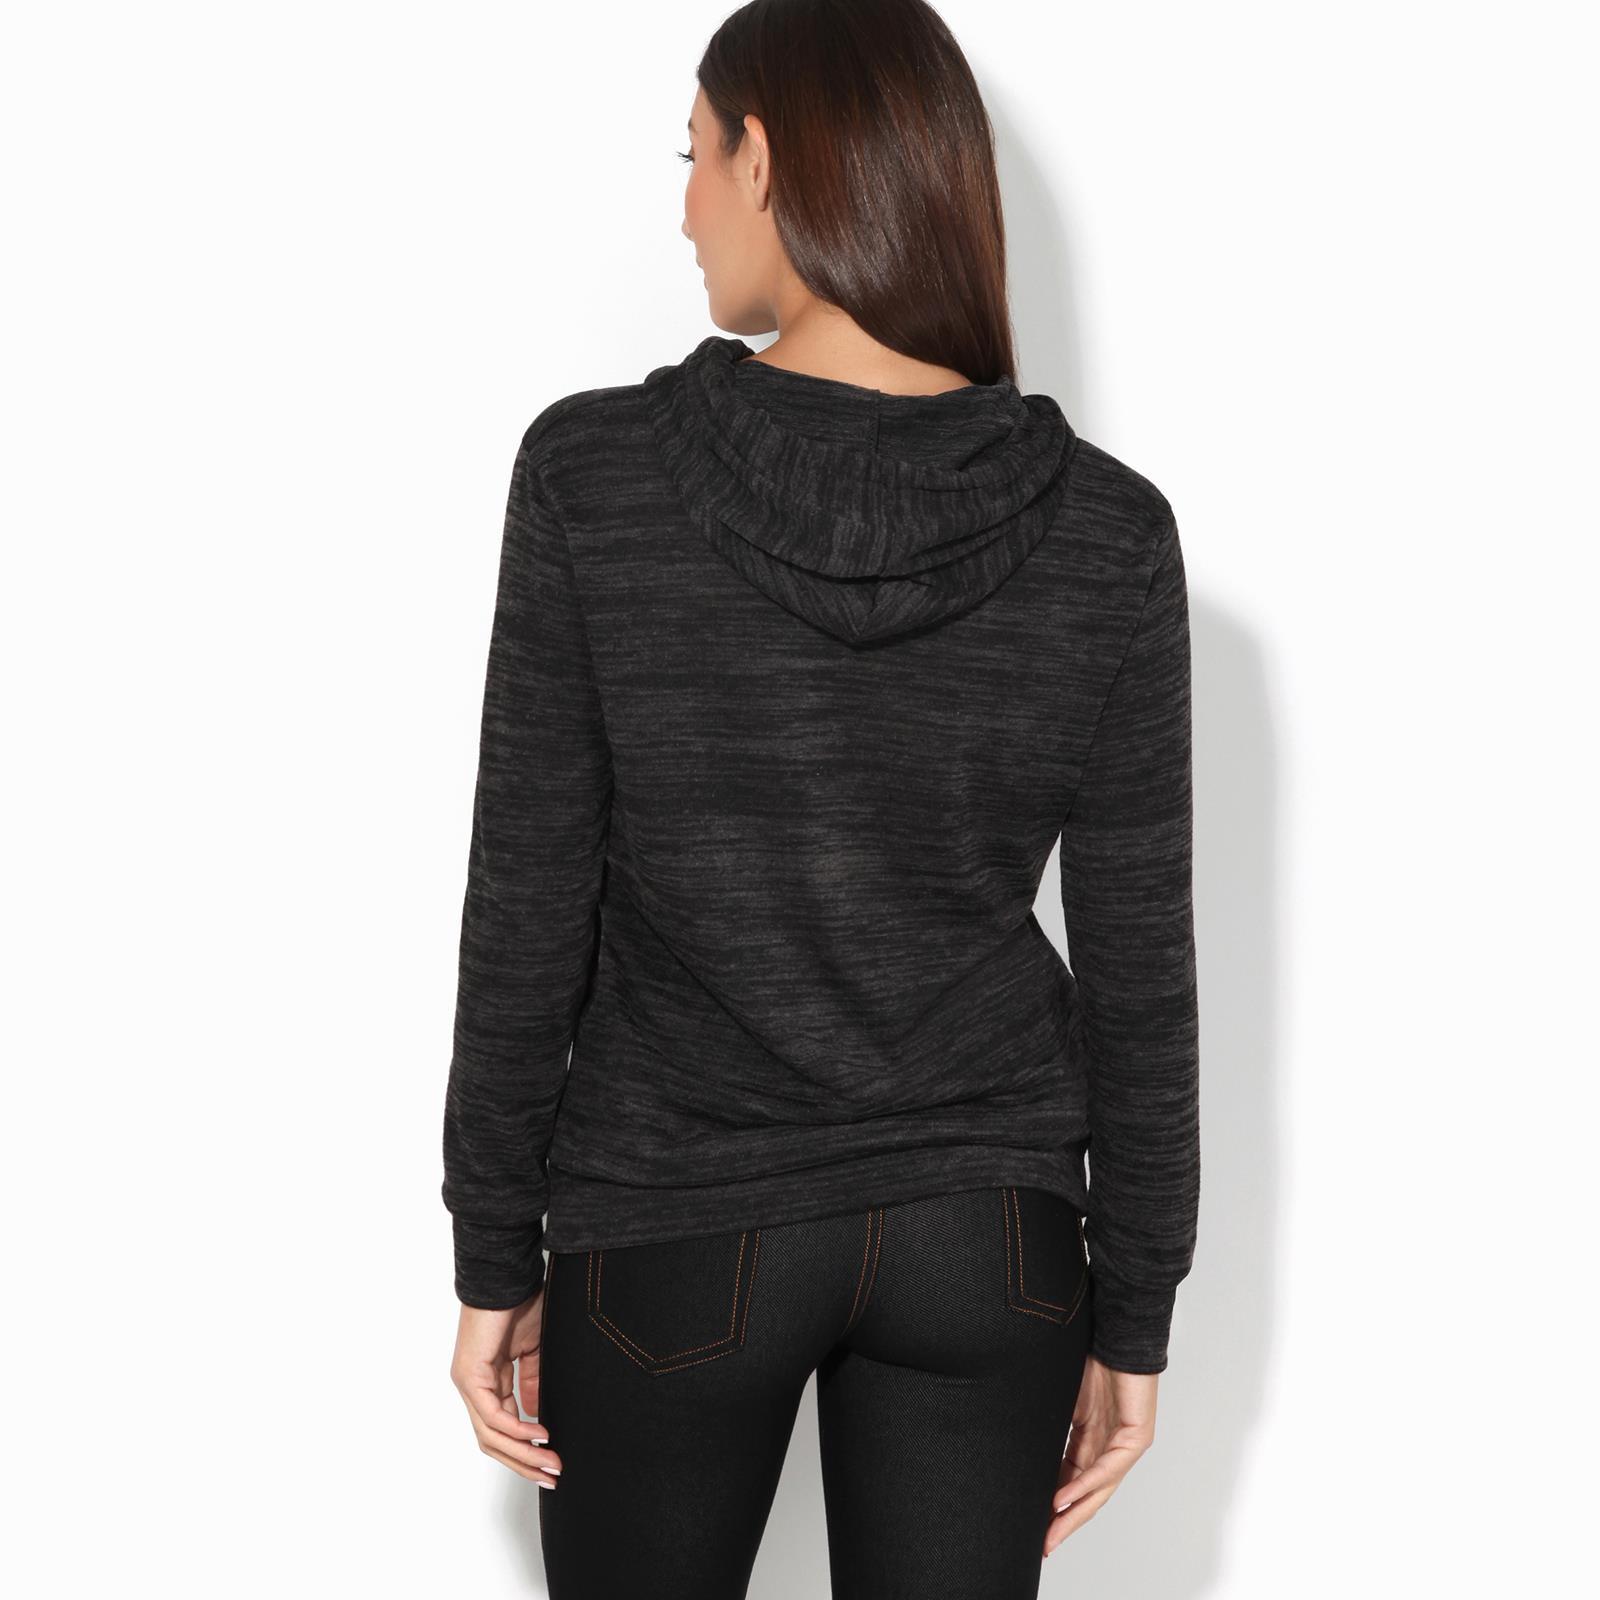 Womens-Soft-Marl-Knit-Hoodie-Hooded-Loose-Baggy-Jumper-Sweater-Top-Sweatshirt thumbnail 3